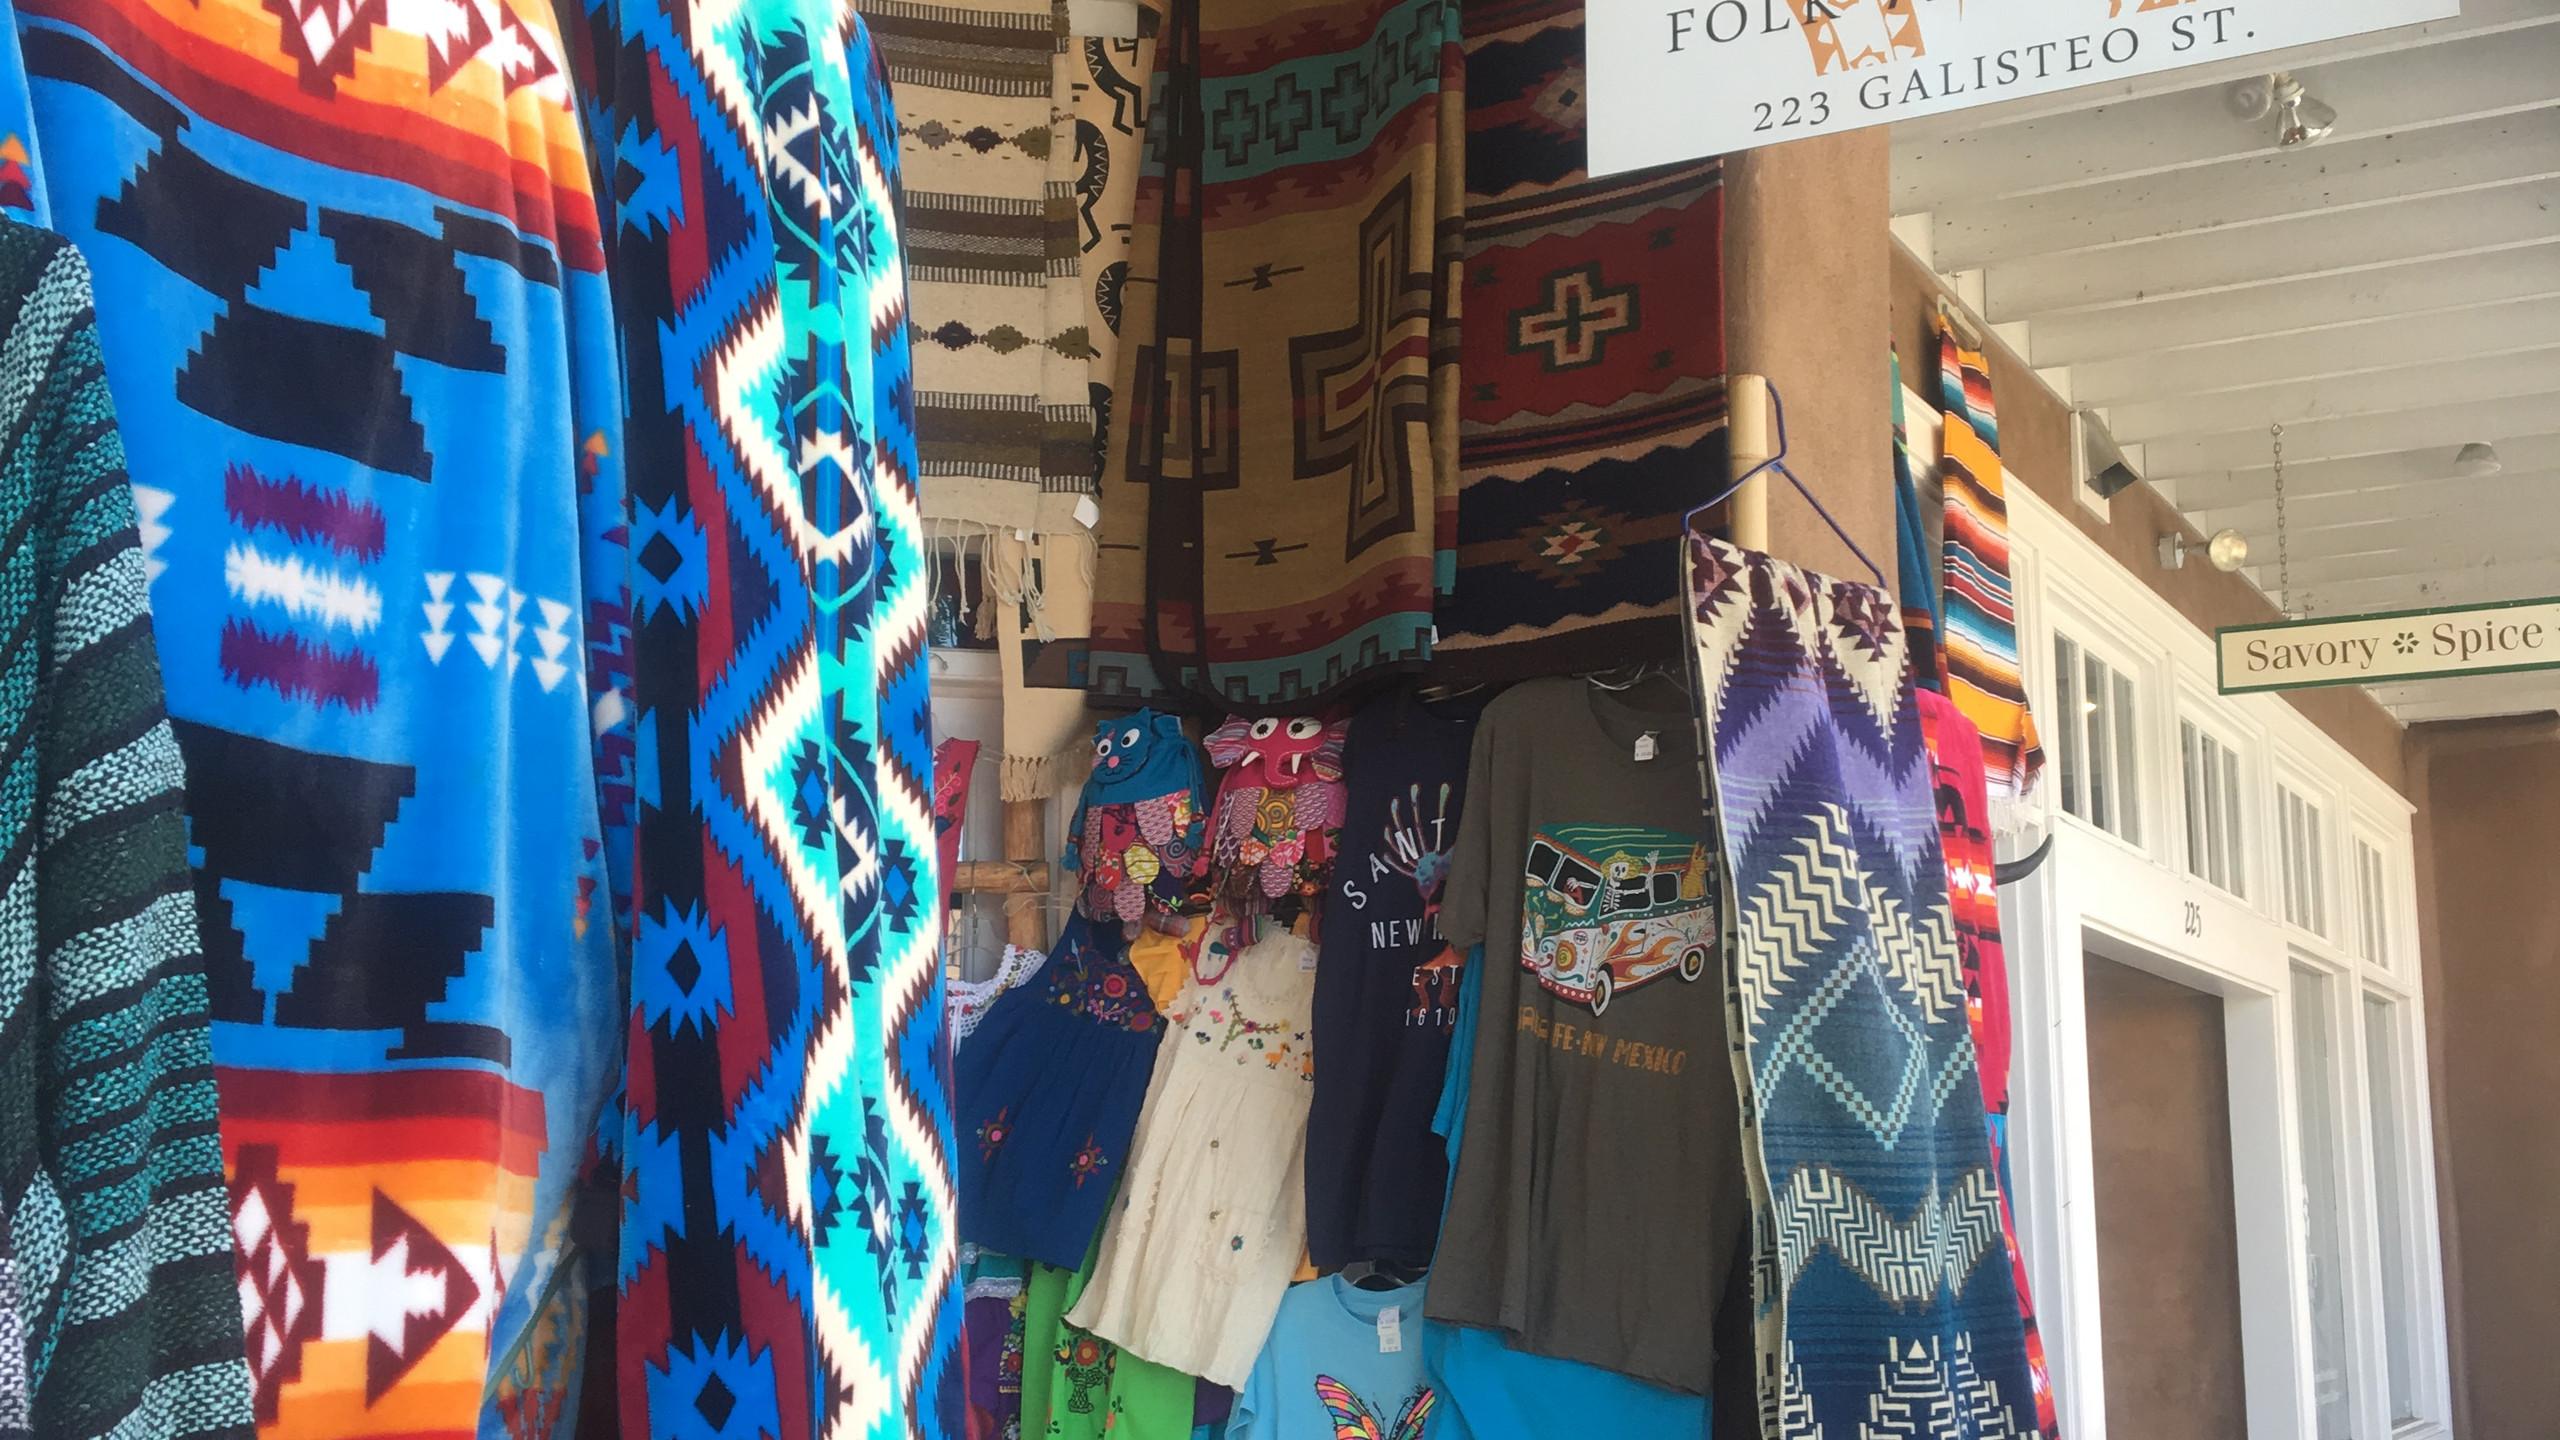 A budget-friendly shop for Southwestern style souvenirs.